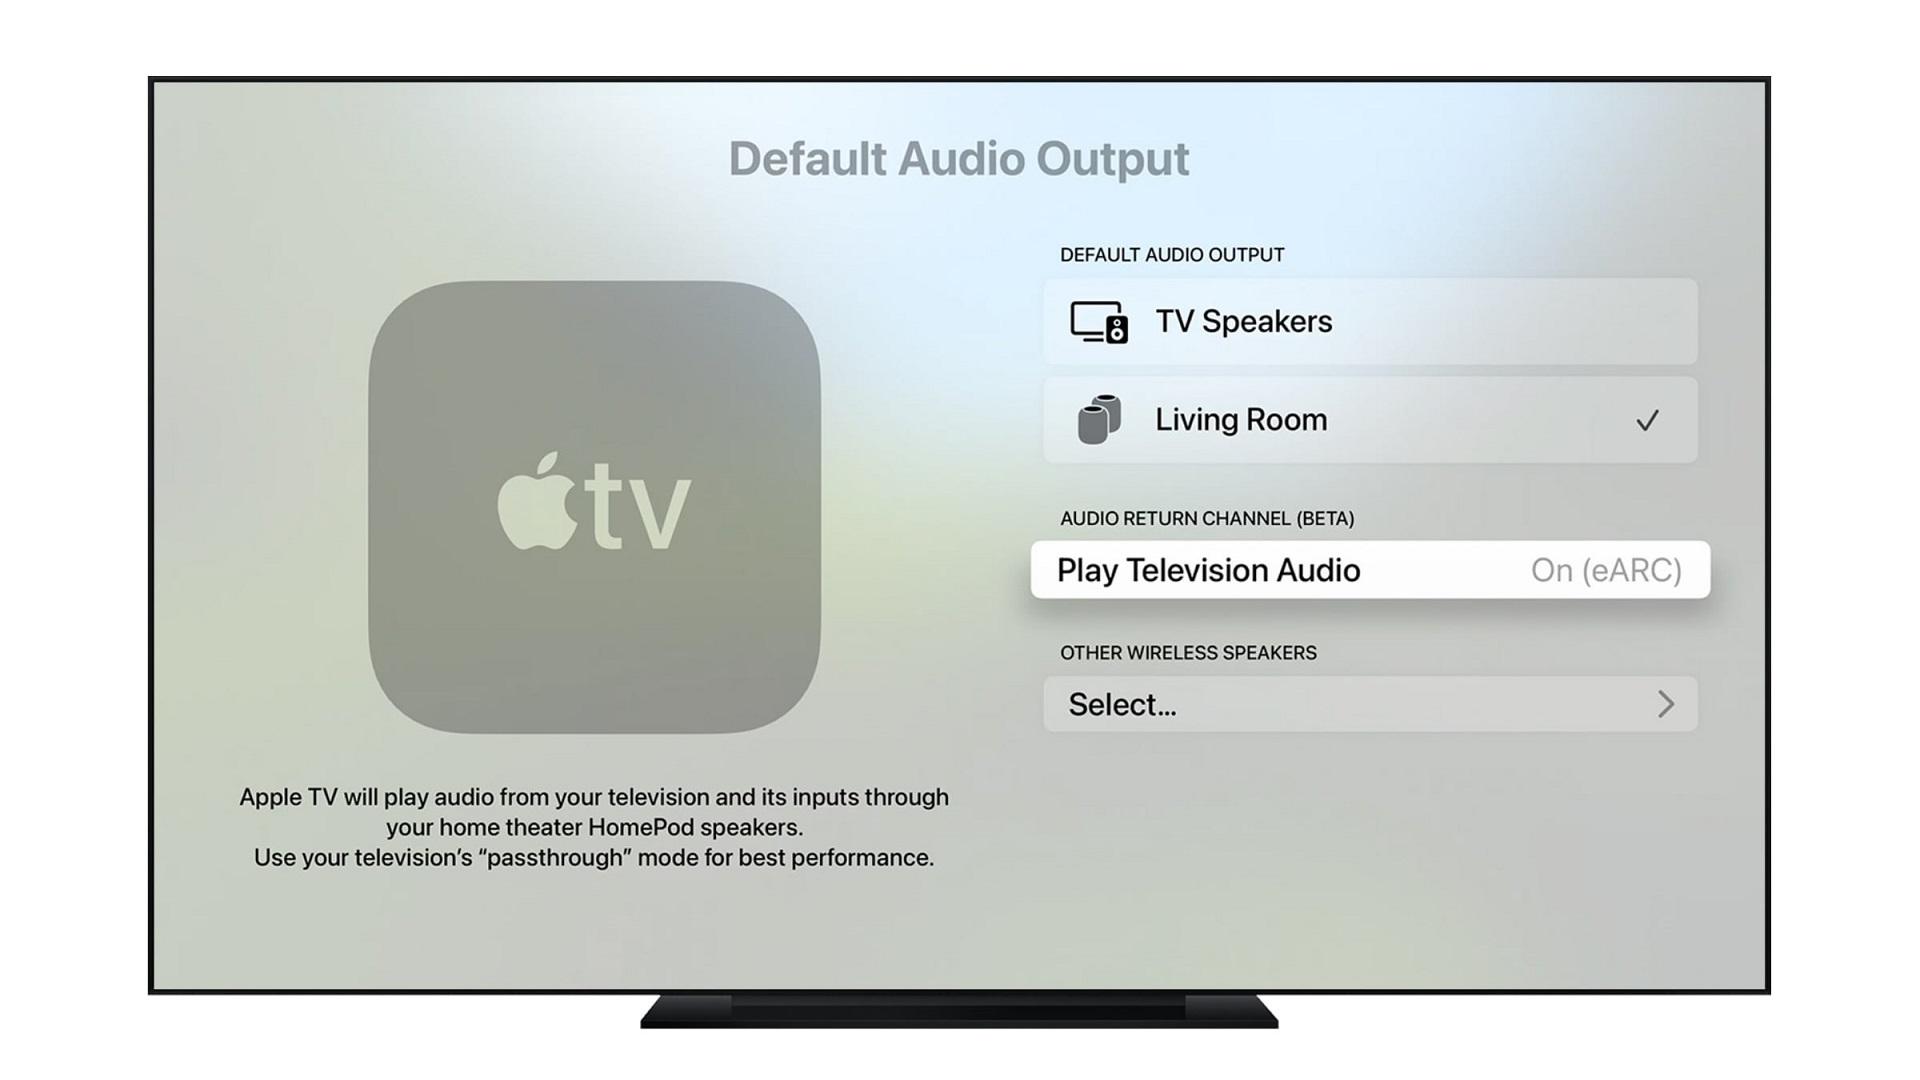 Apple TV HDMI ARC/eARC